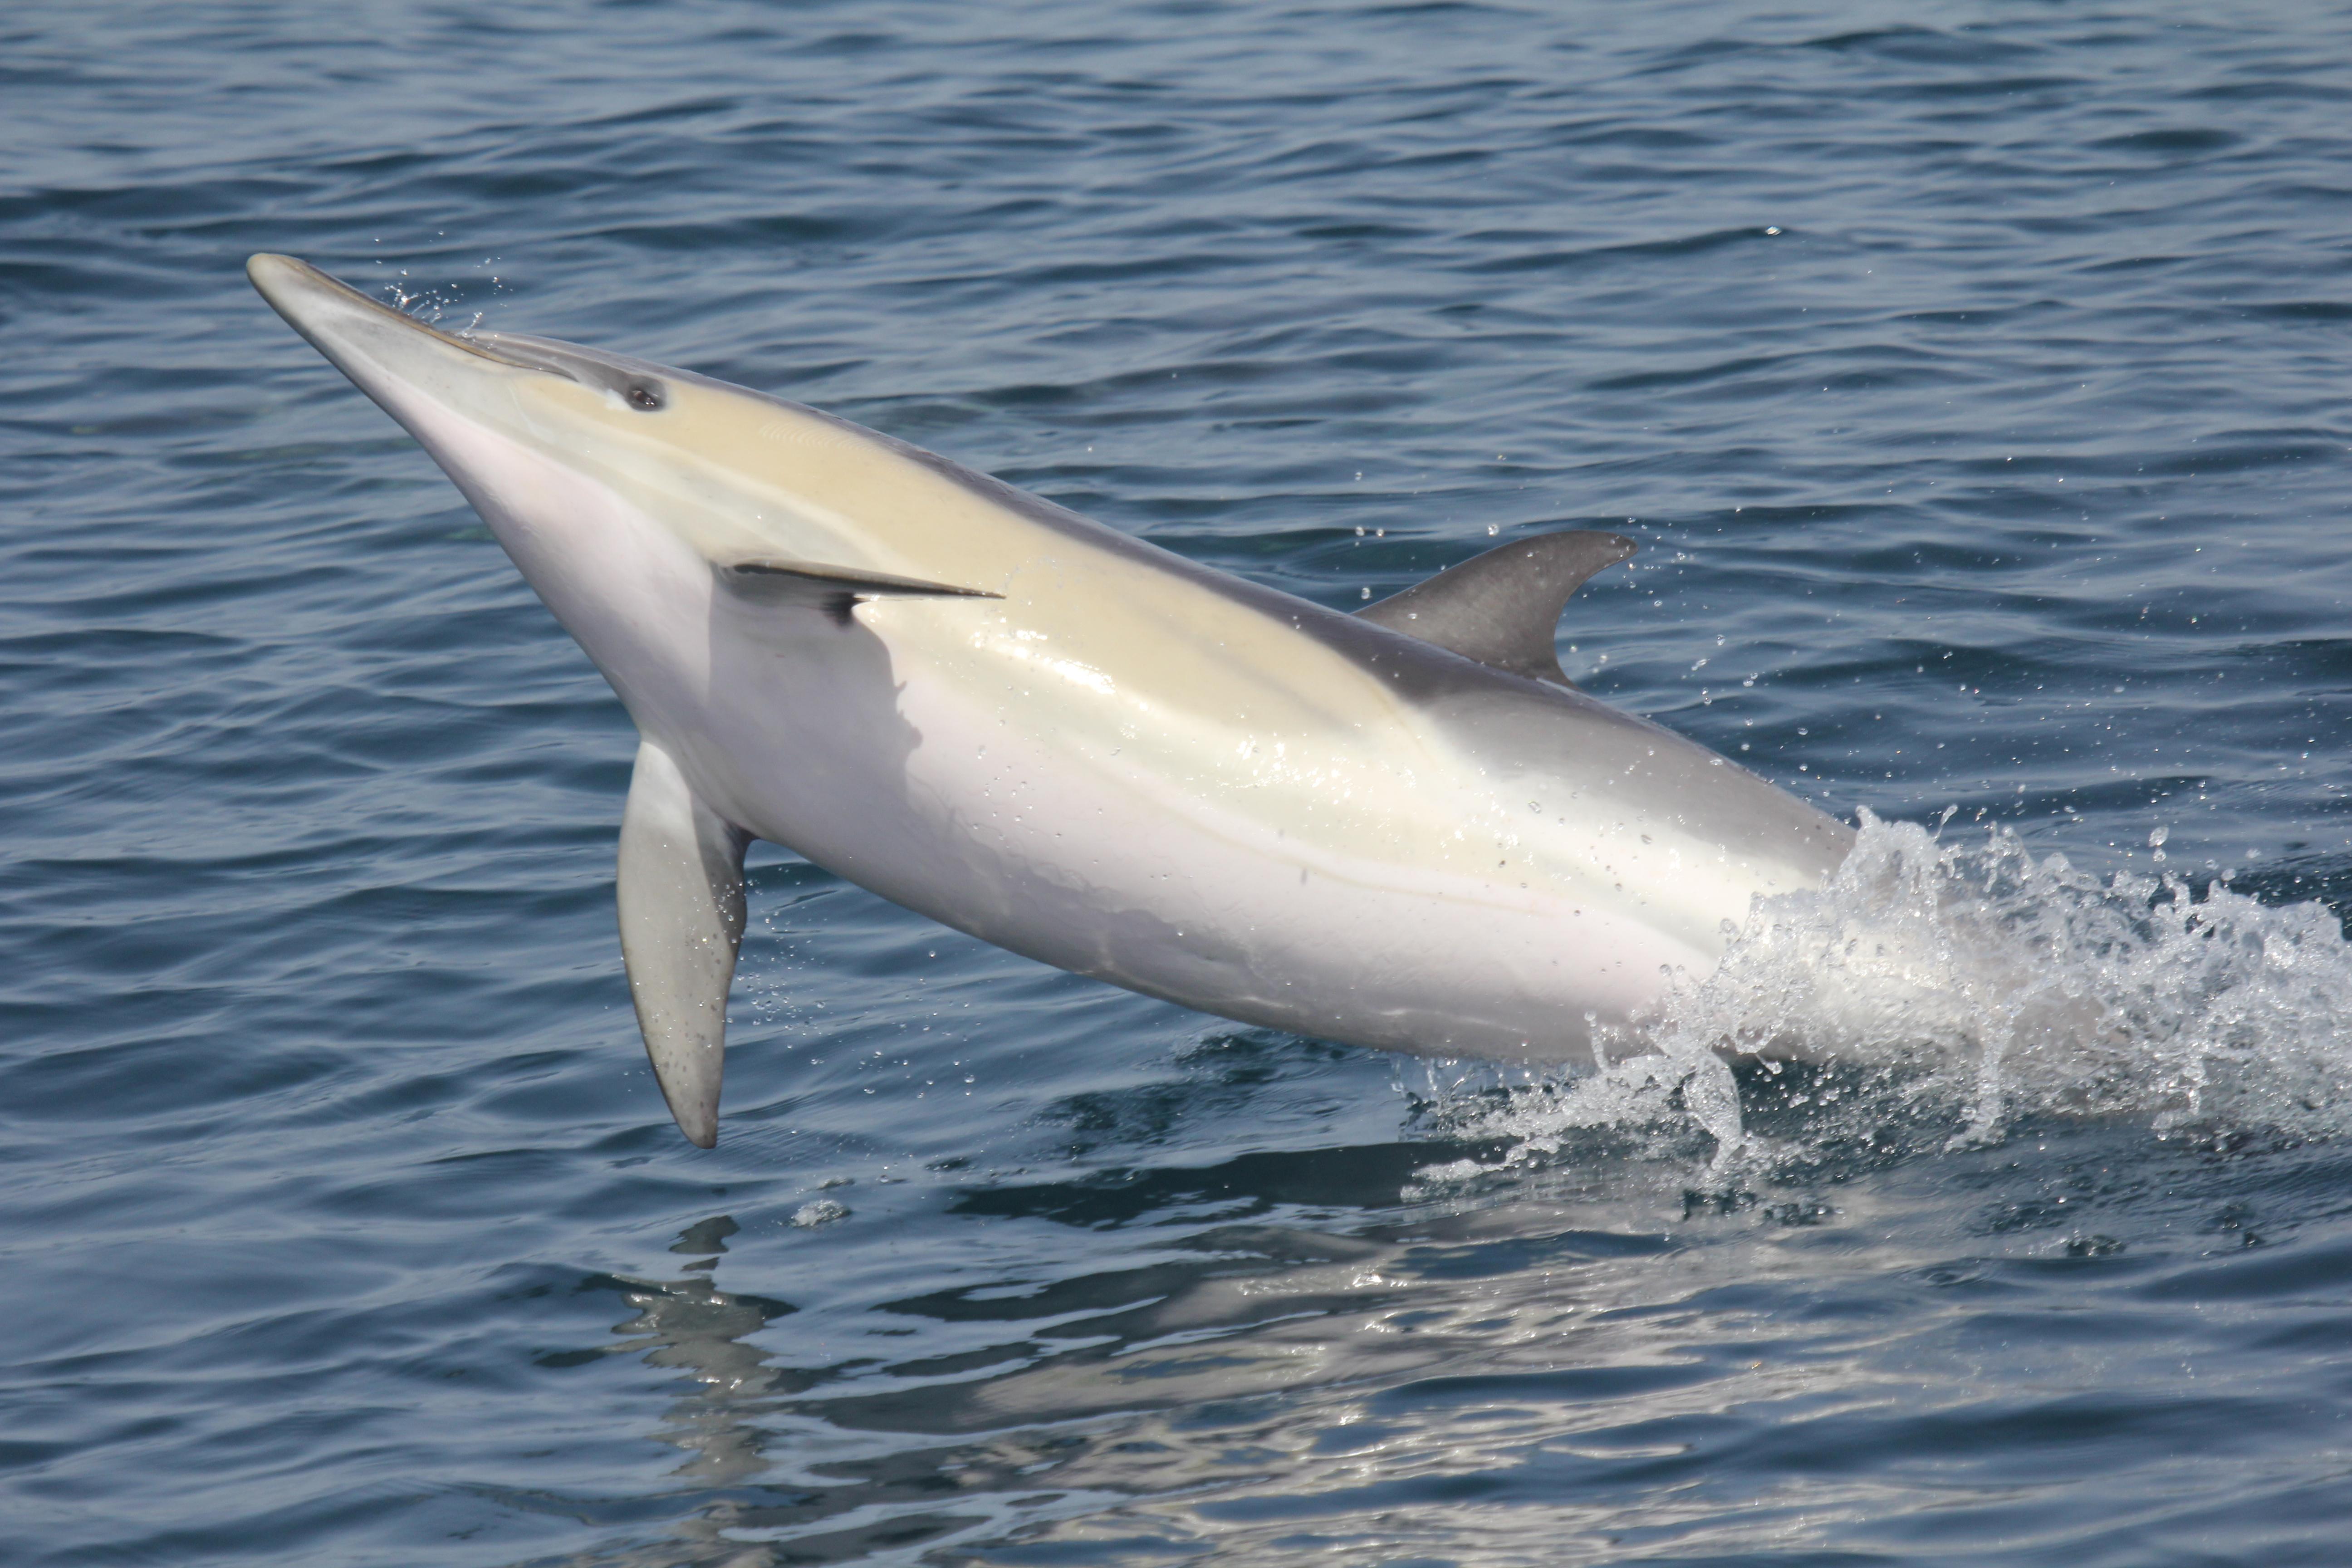 Ejemplar de delfín en el Mar de Alborán. Imagen: CIRCE /CSIC